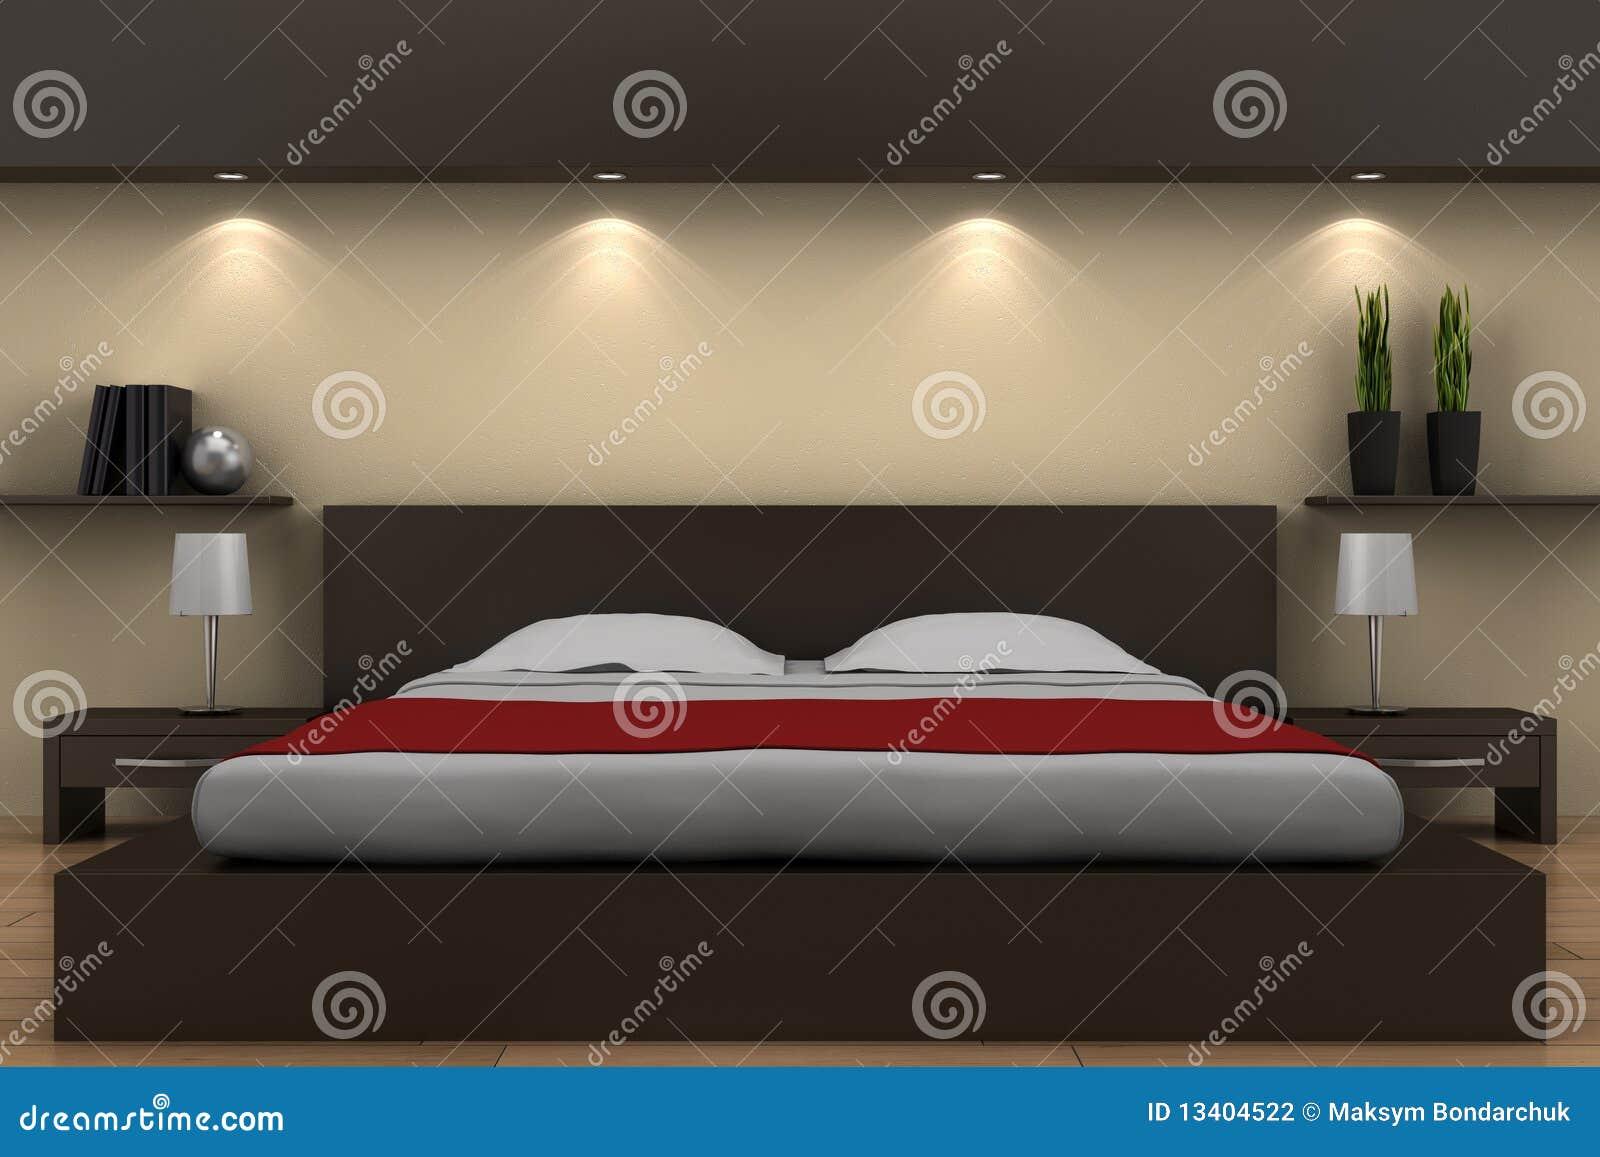 Slaapkamer Bruin Bed : Moderne Slaapkamer Met Bruin Bed Stock ...